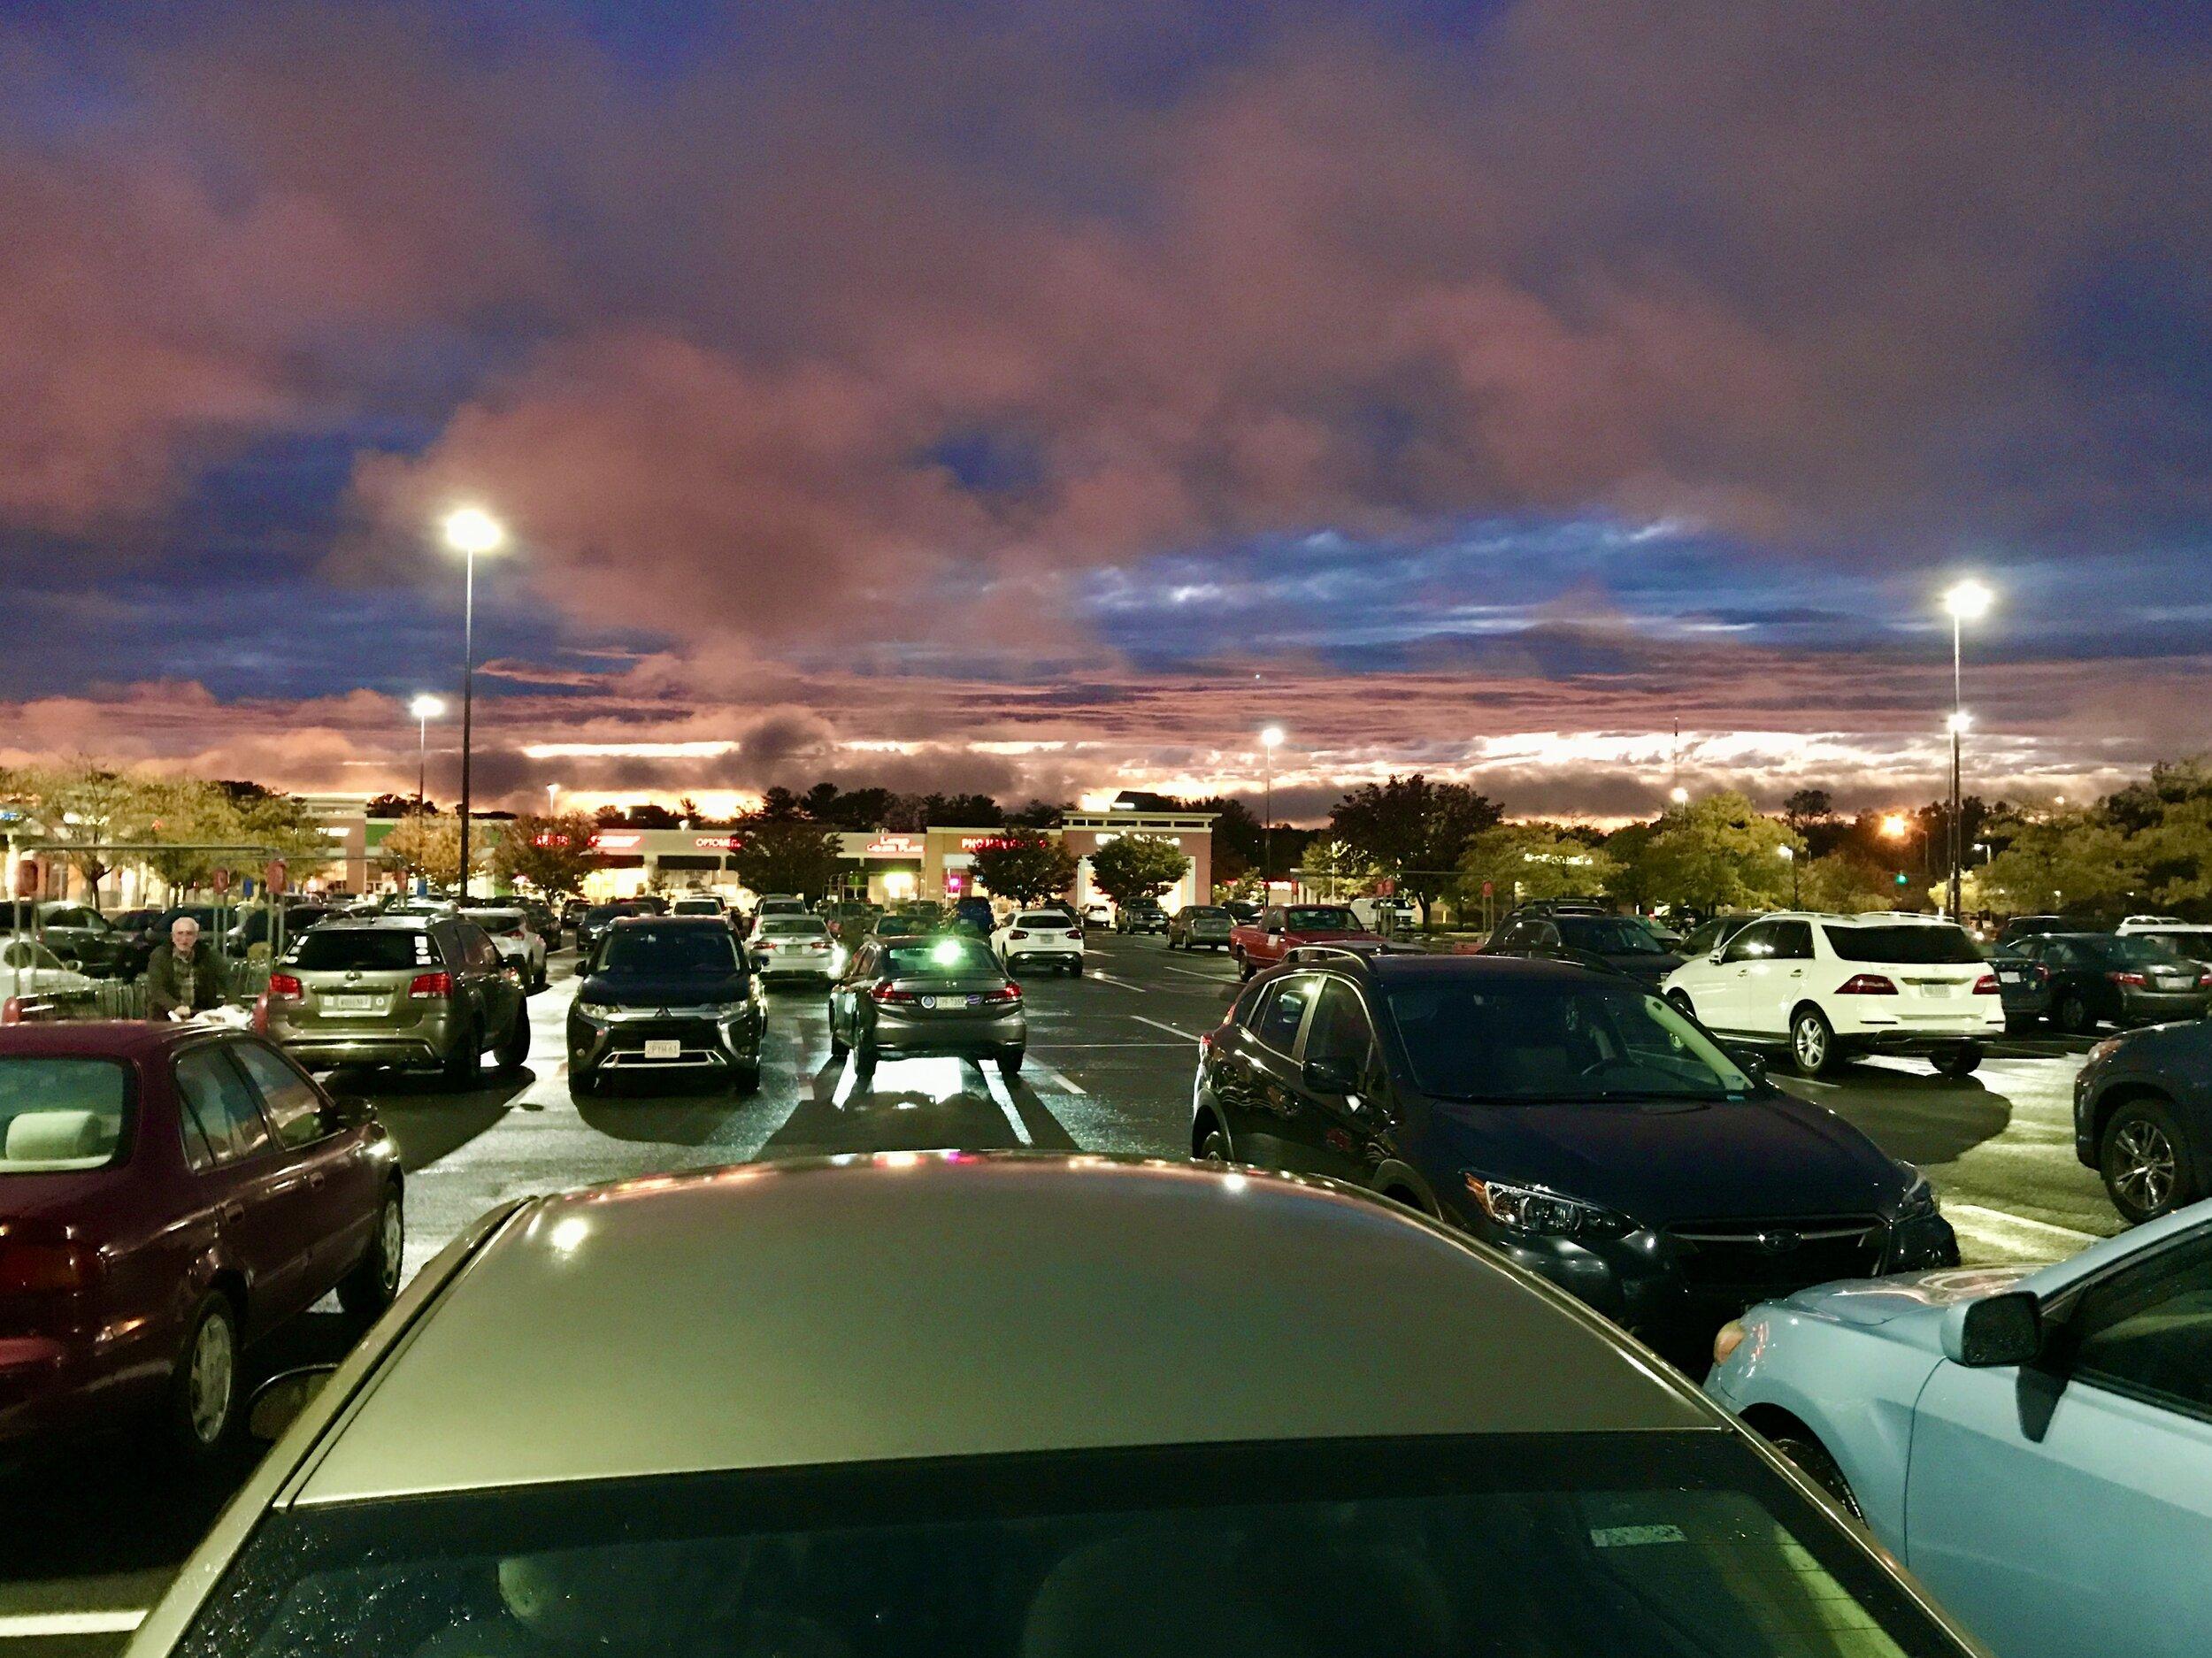 Sunset: Falls Church, Virginia